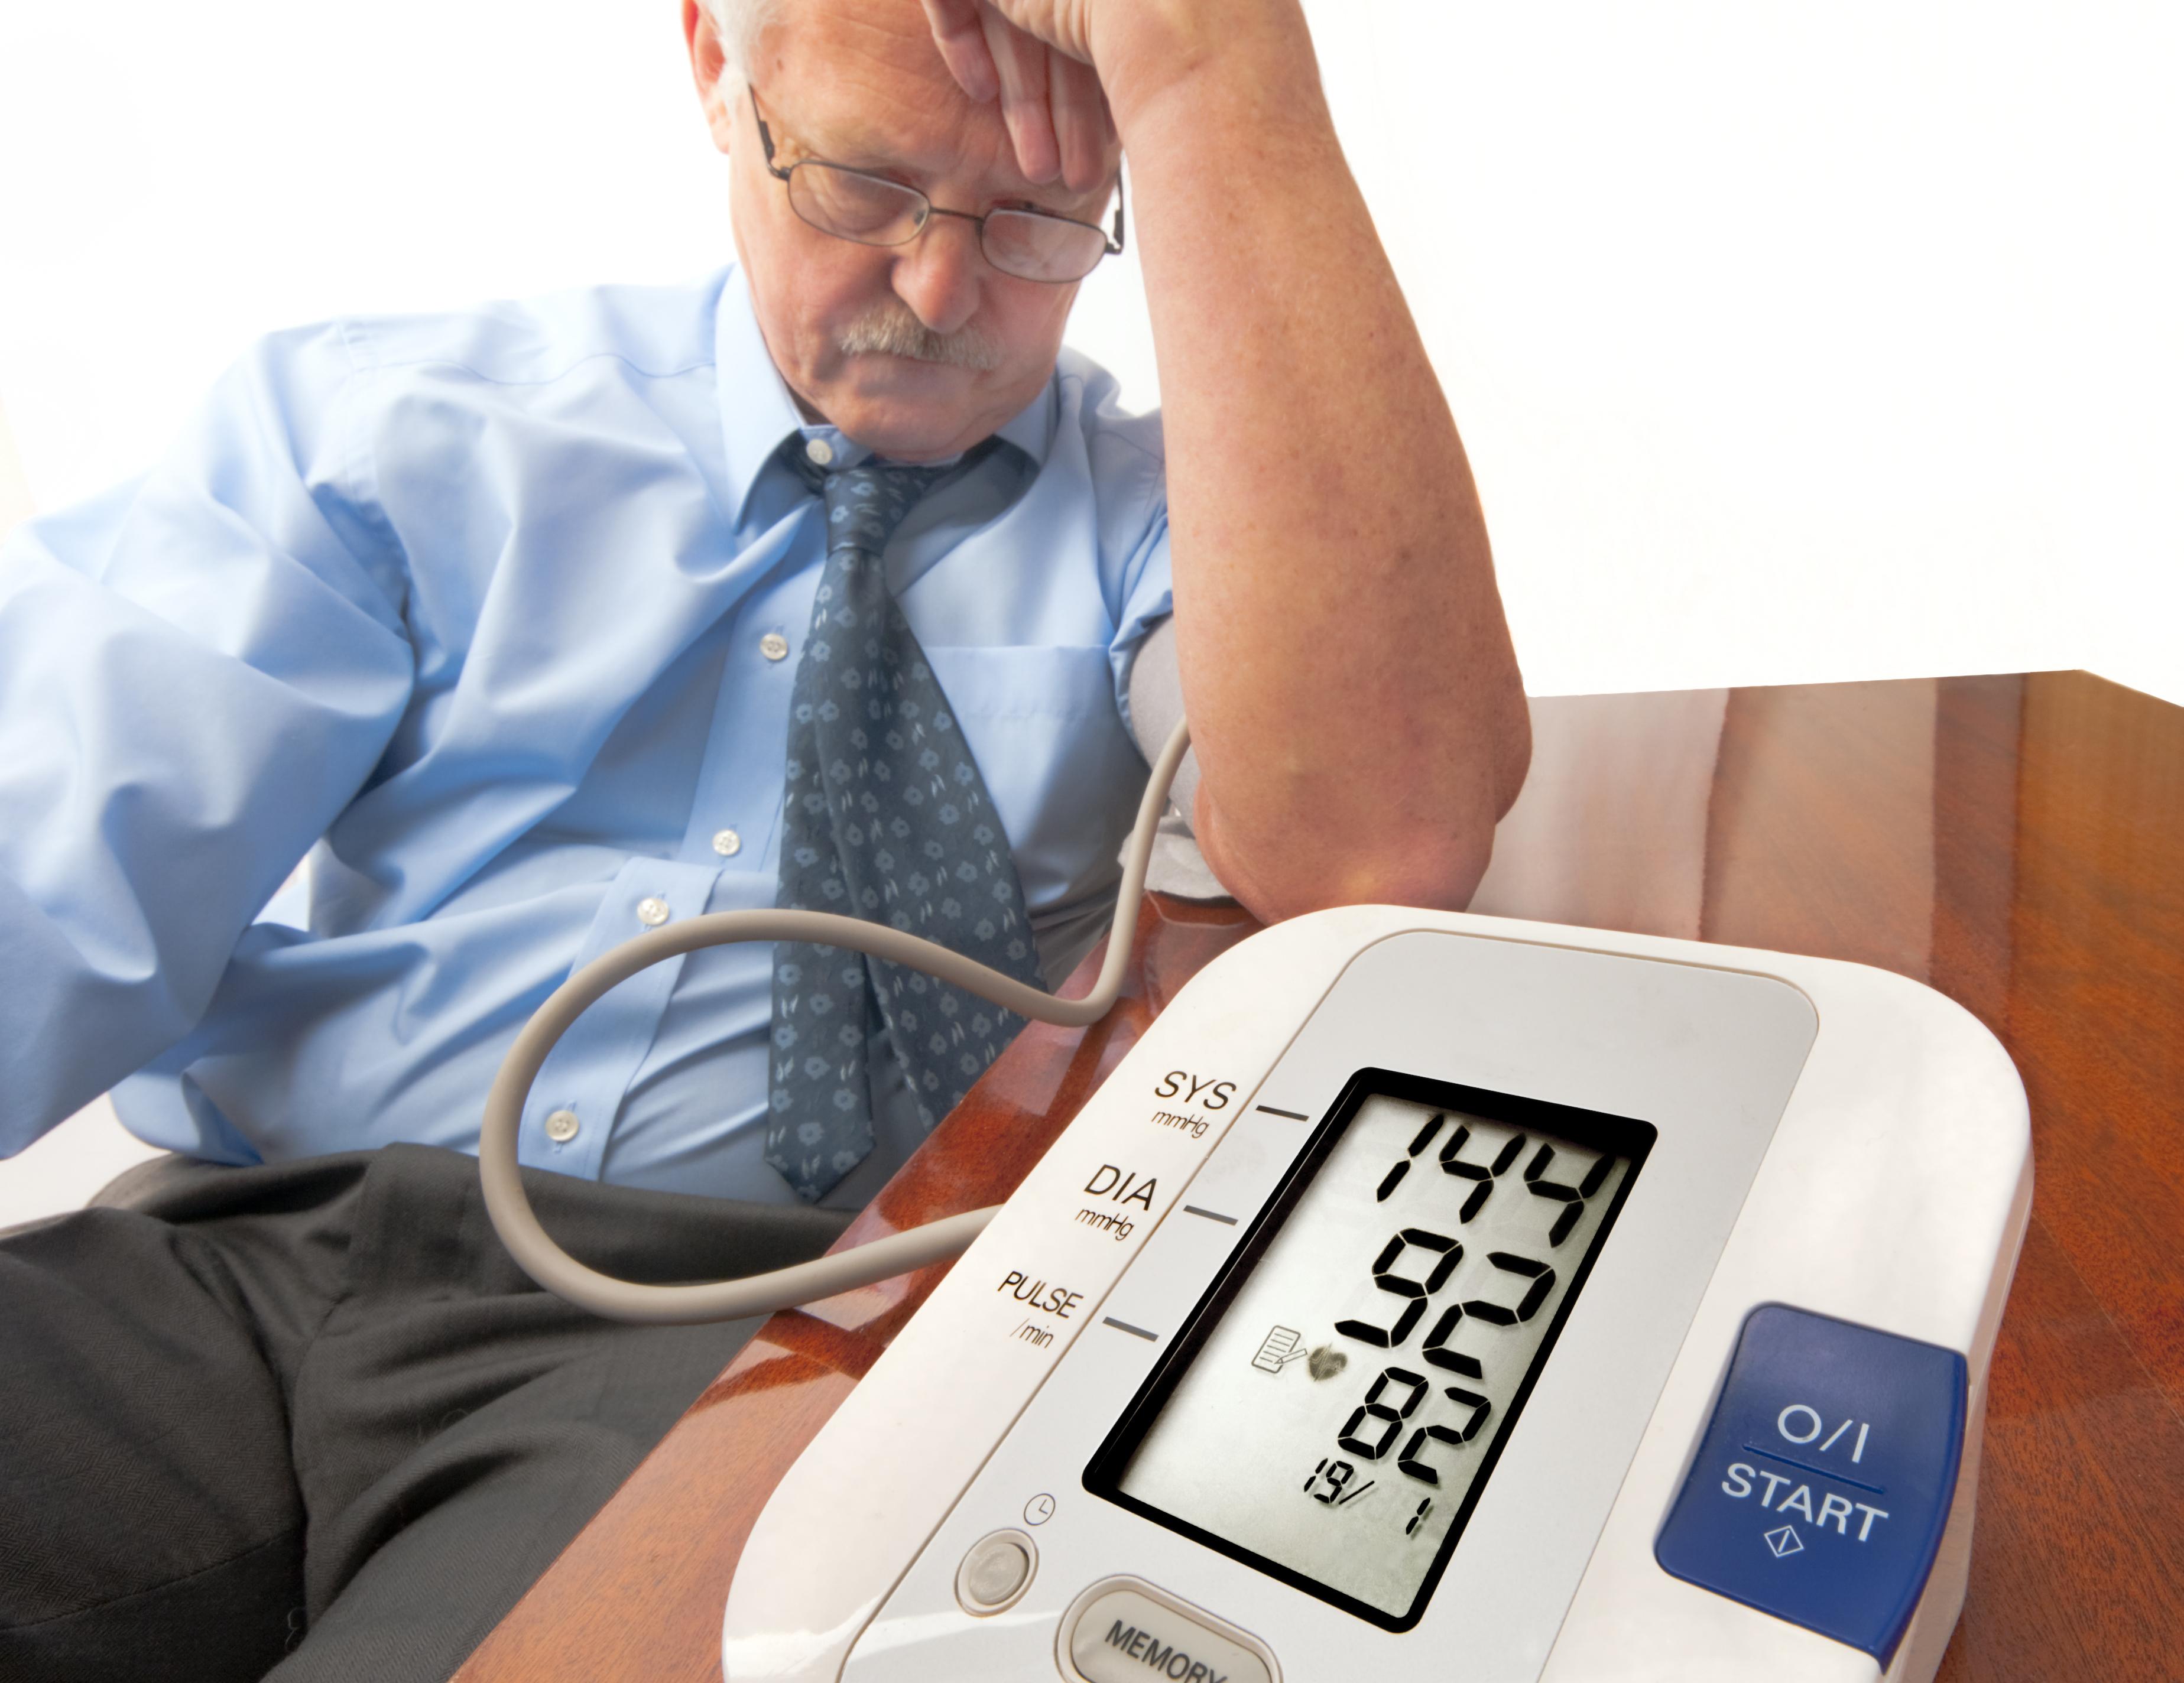 magas vérnyomás 3 kockázat magas vérnyomás nyomásnorma